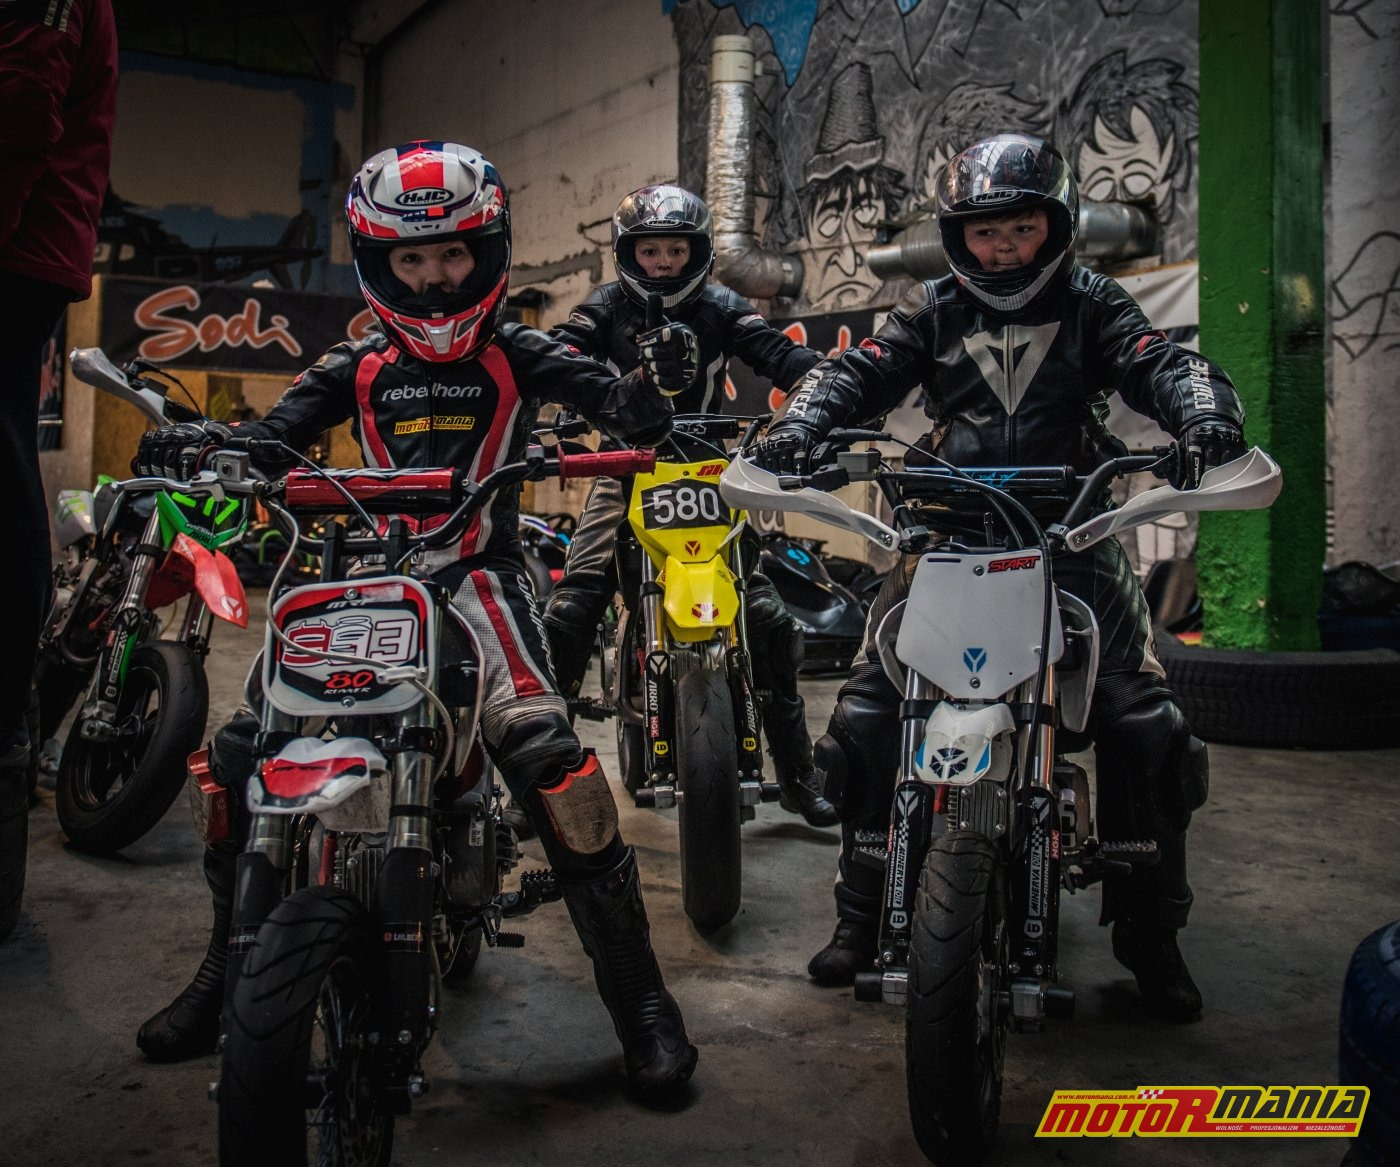 MotoRmania KidzGP Team - treningi przed sezonem 2019 (5)